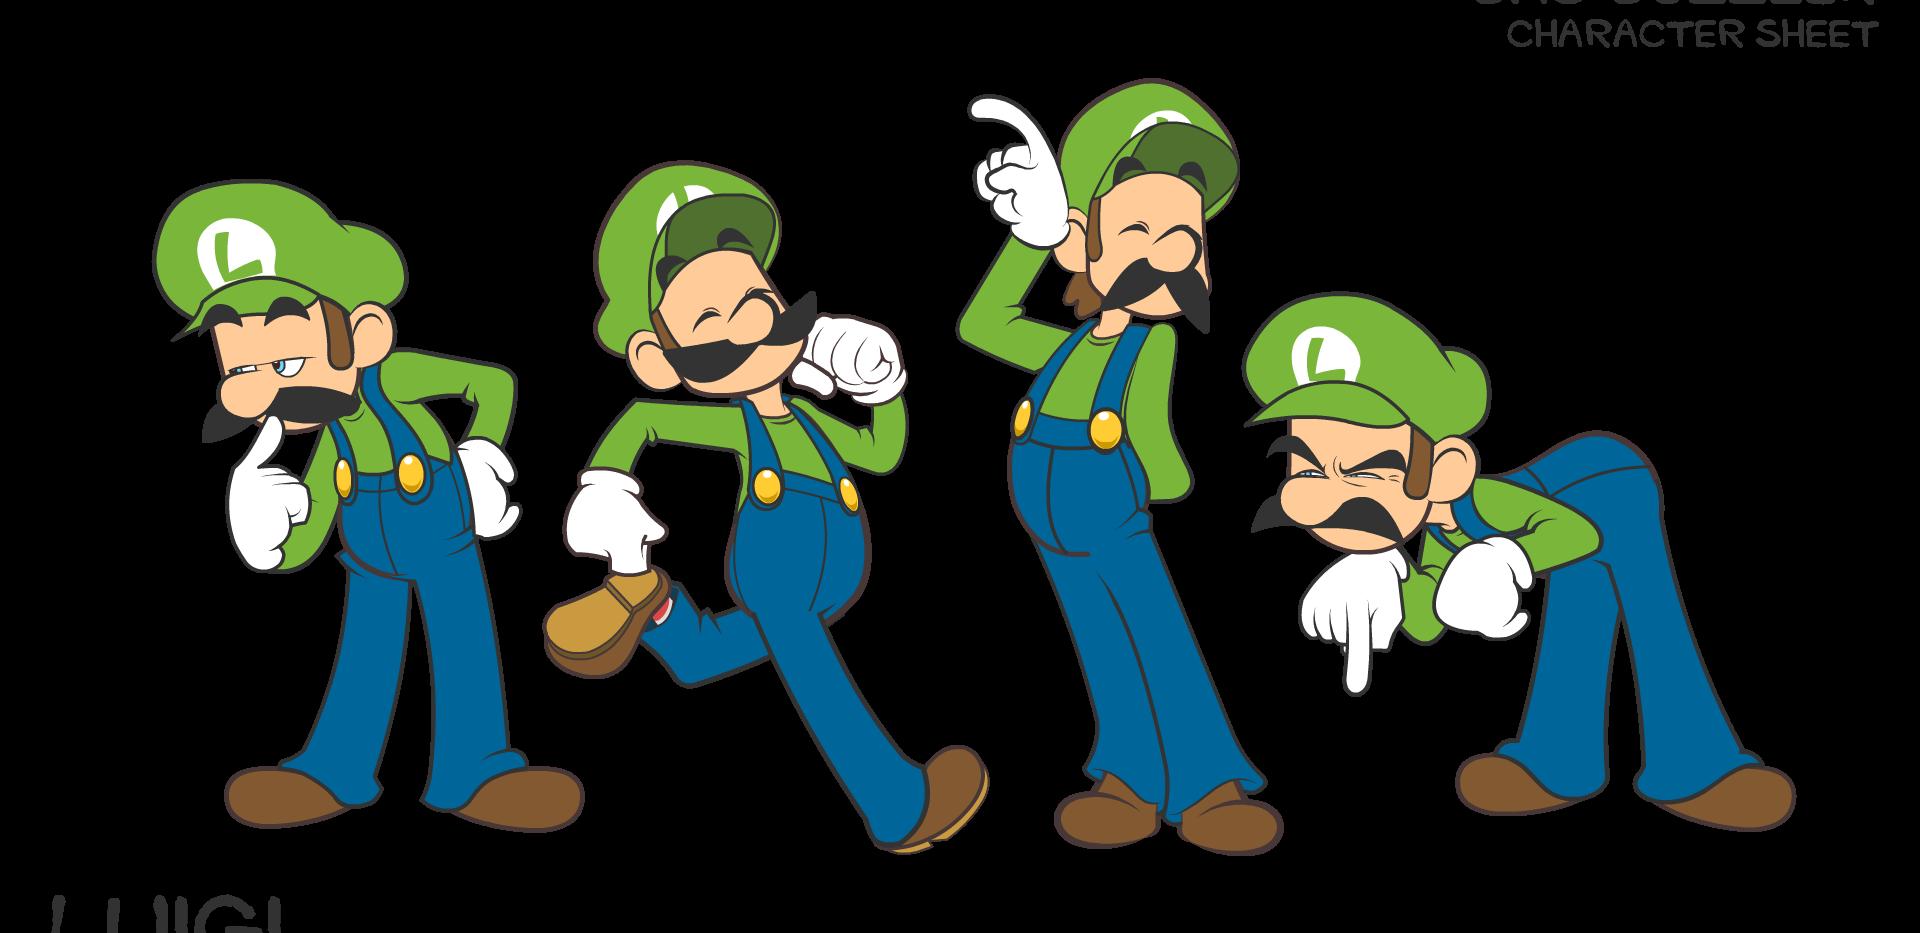 Luigi character sheet.png